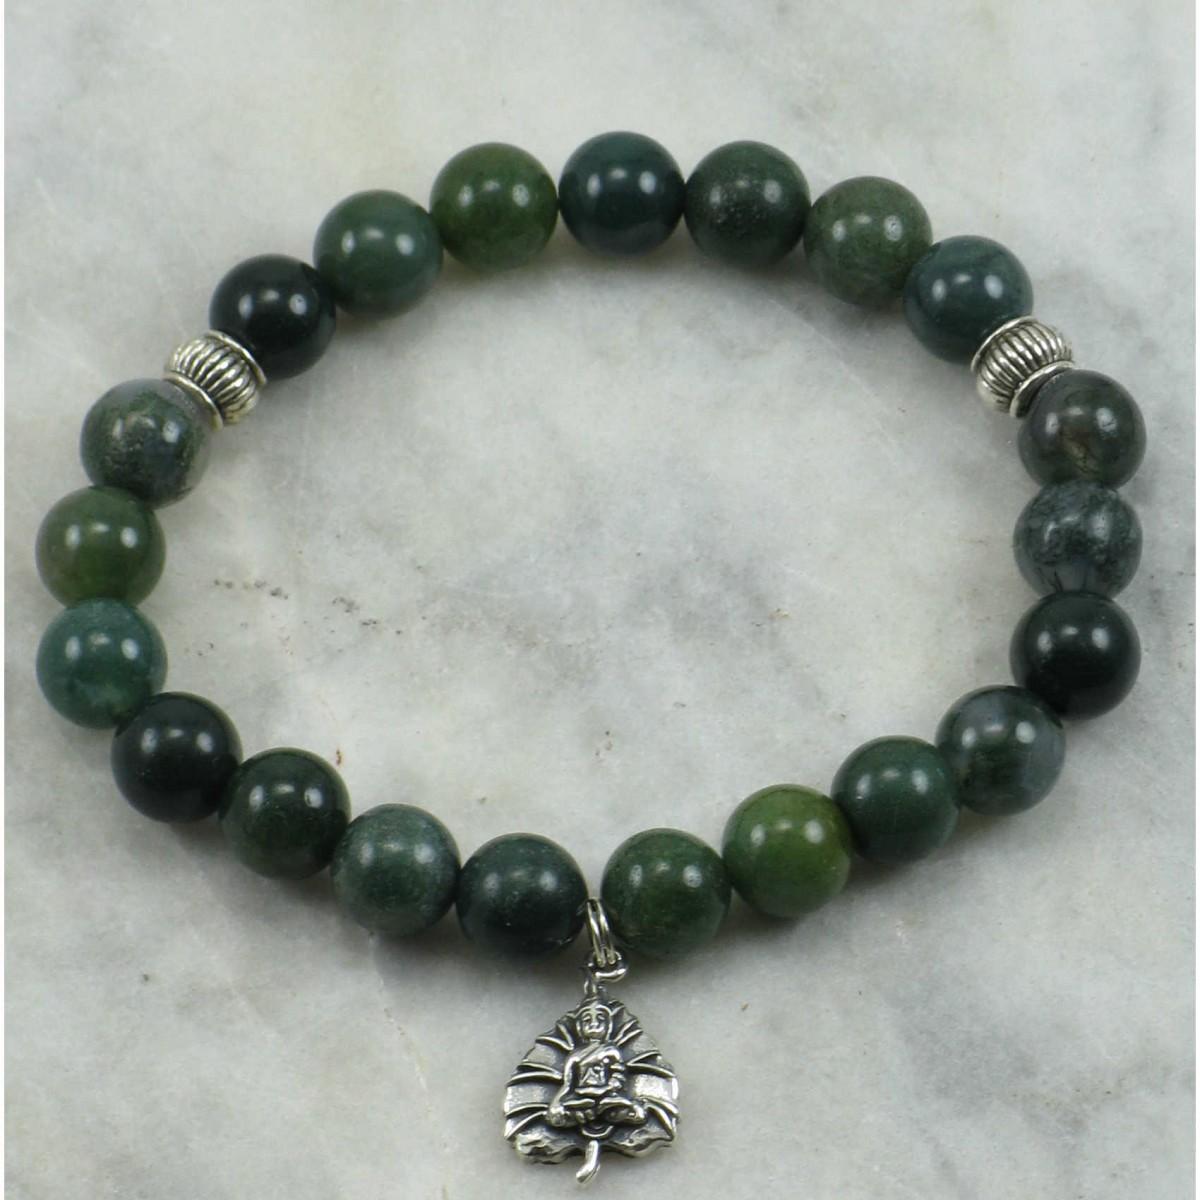 Contemplation_Mala_Bracelet_21_Moss_Agate _Mala_Beads_Buddhist_Bracelet